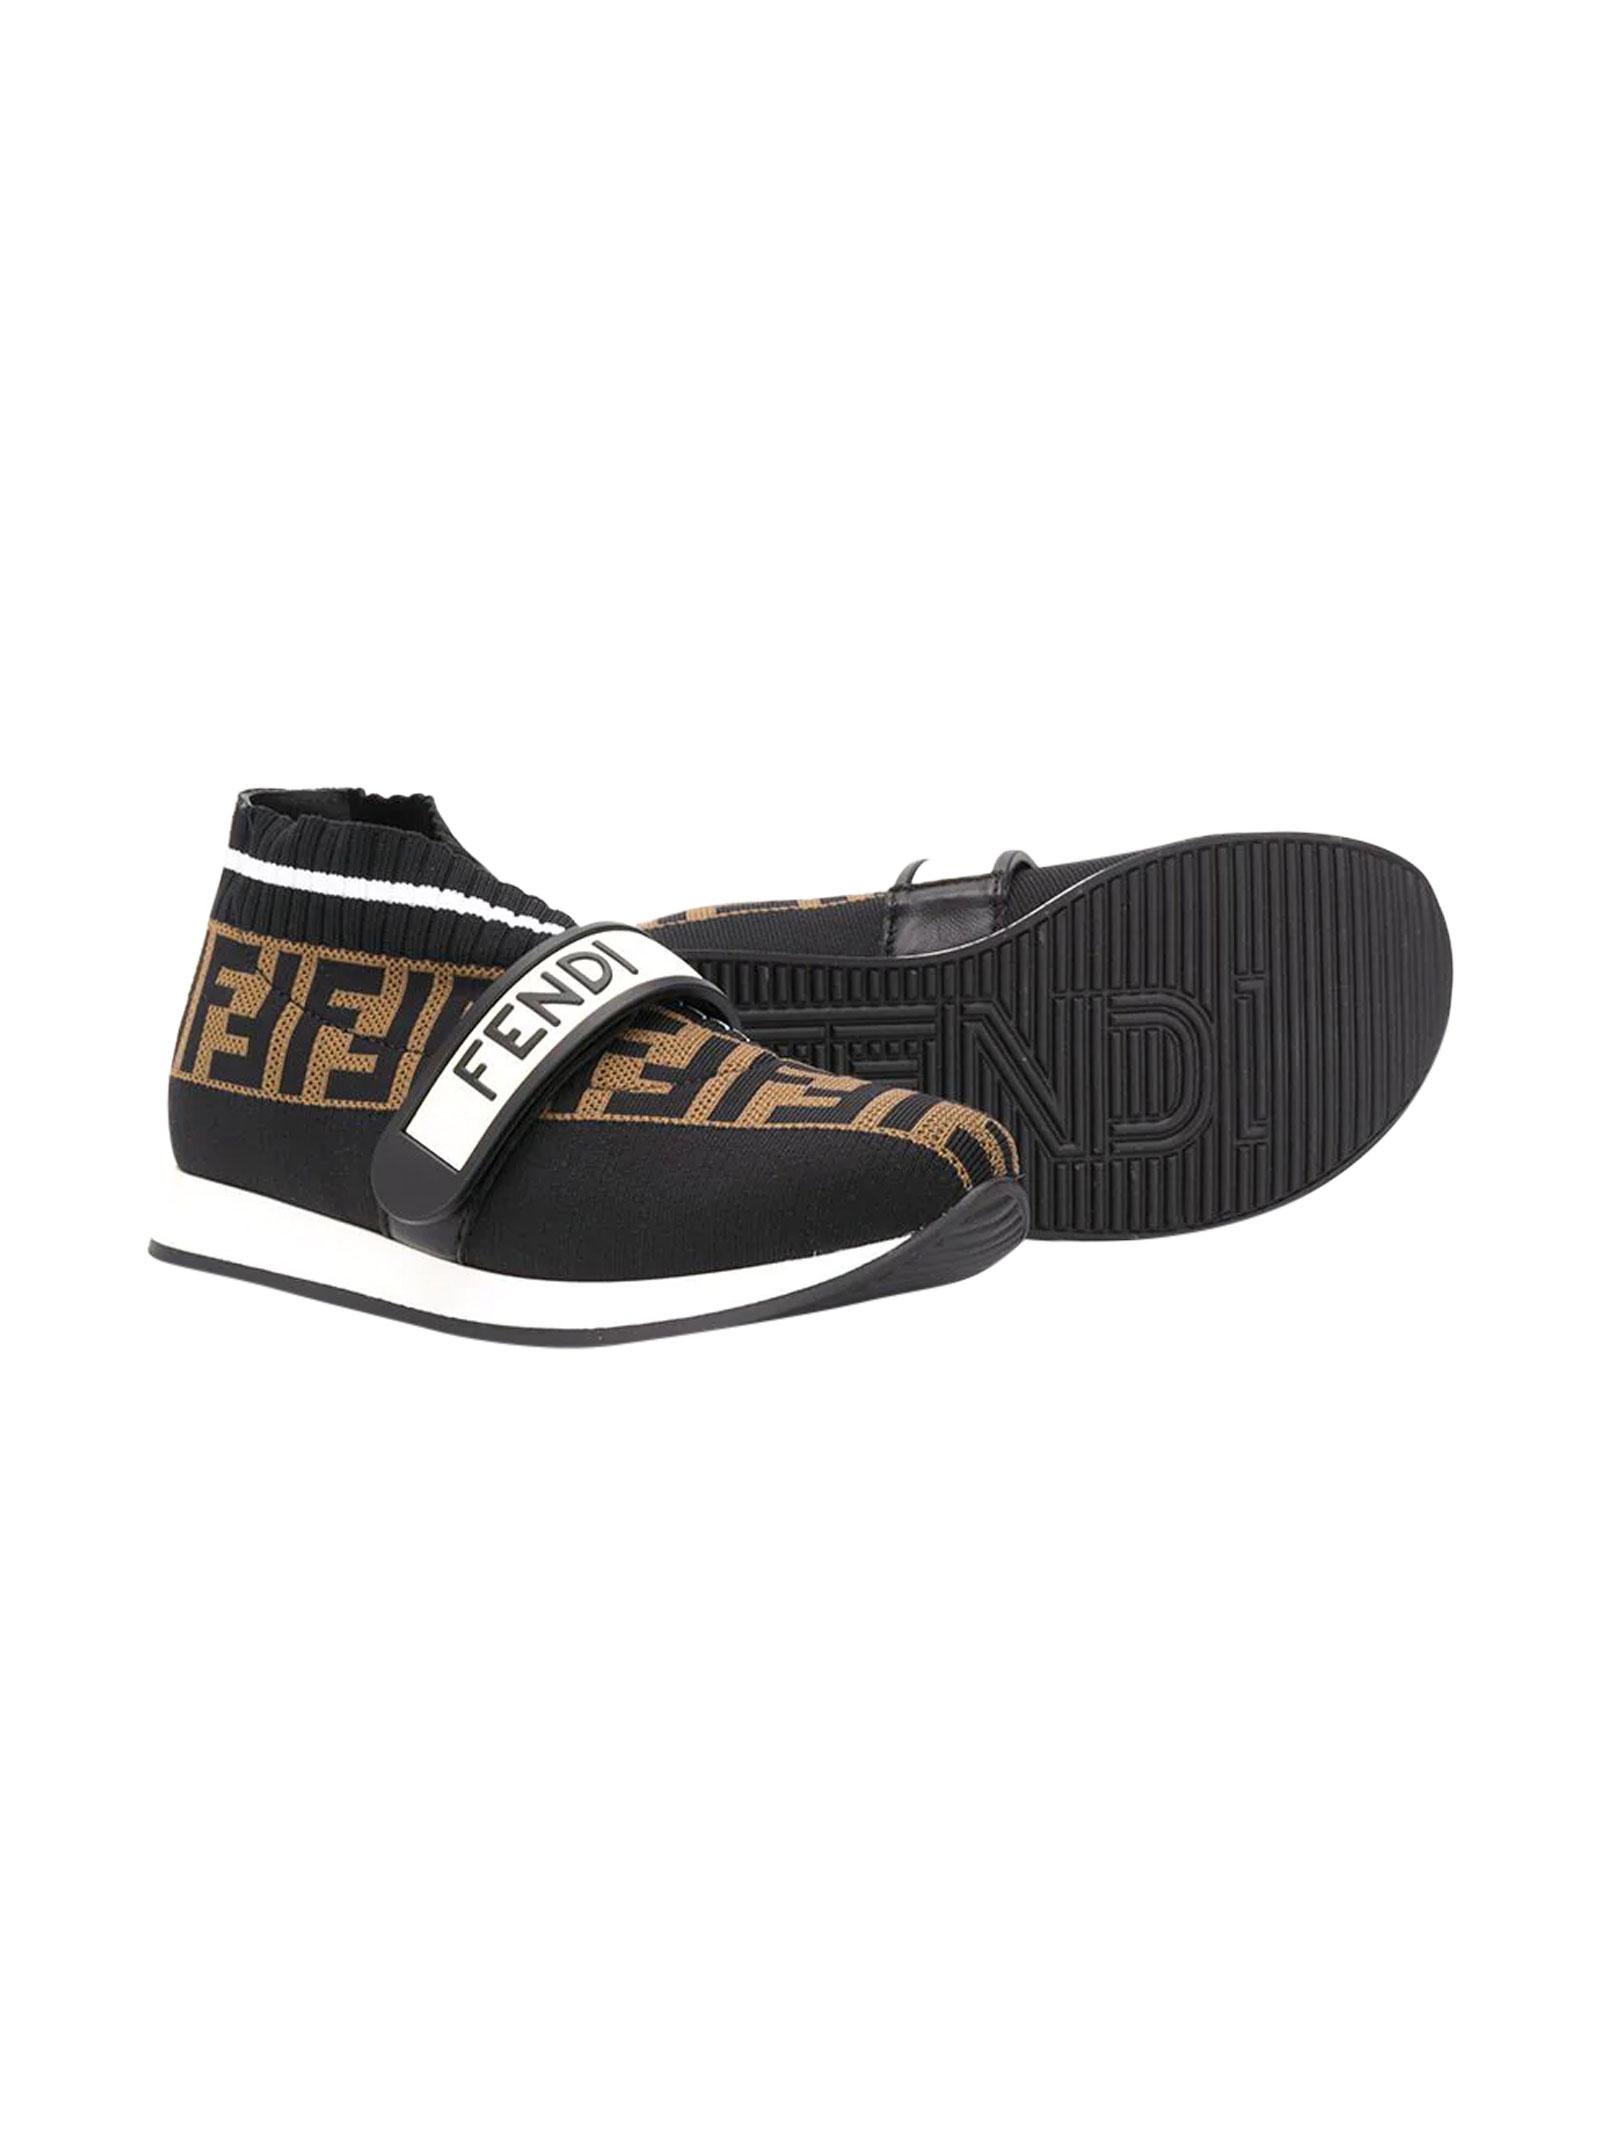 Sneakers Fendi kids - FENDI KIDS